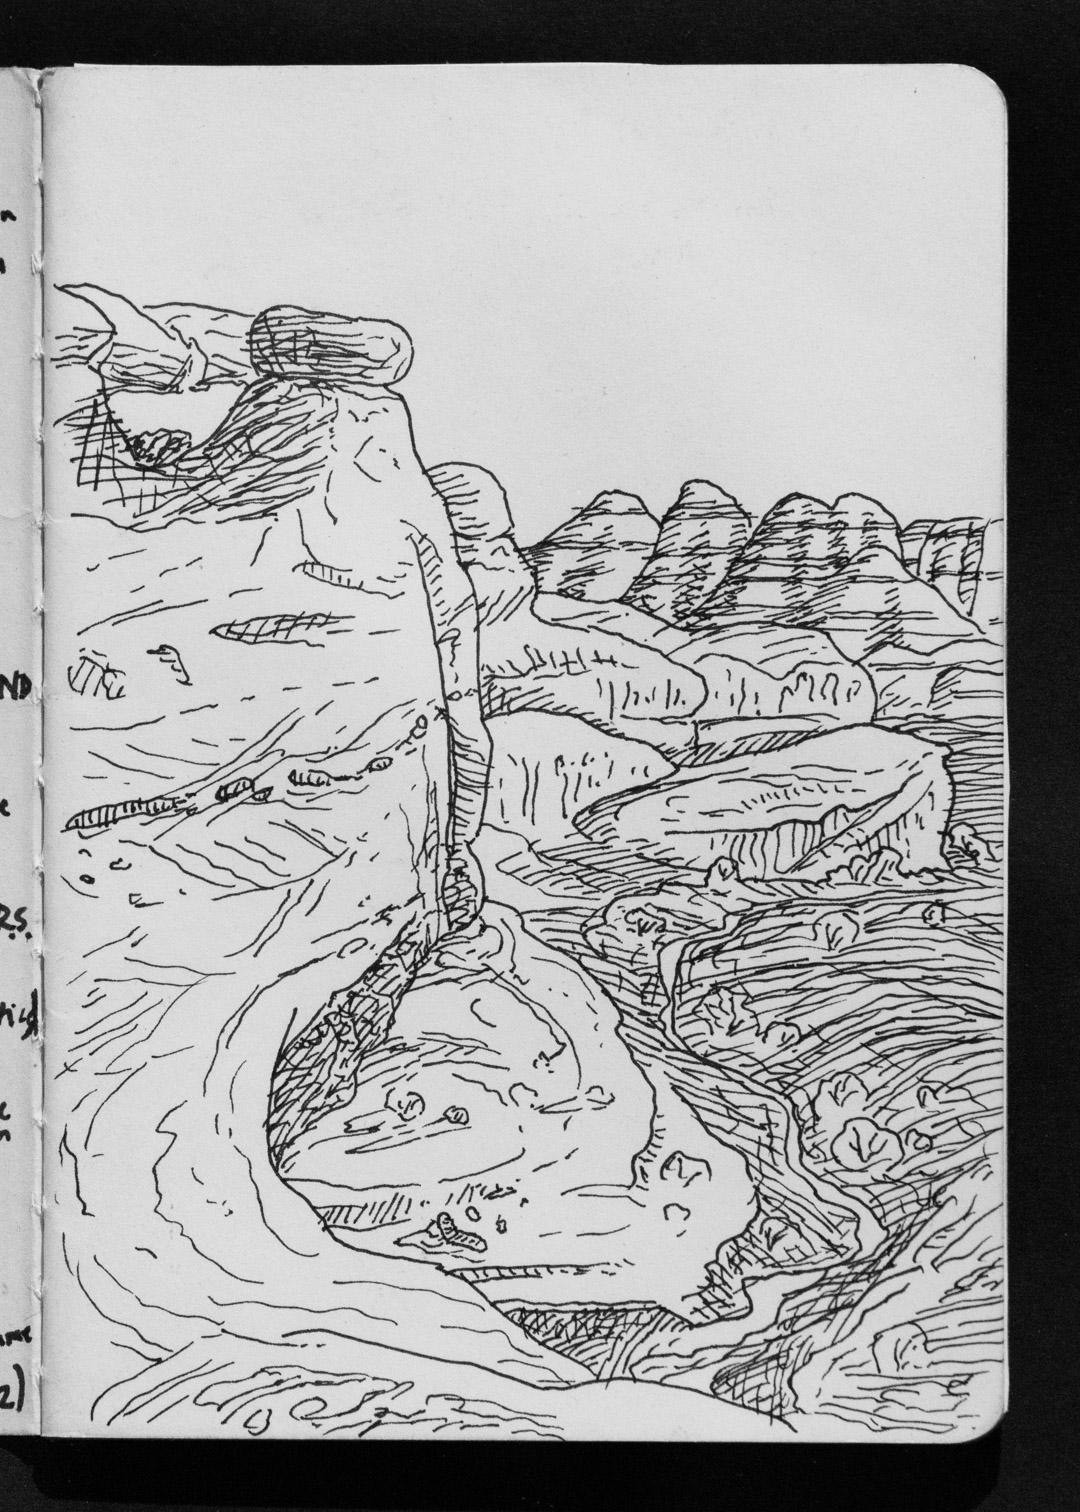 01-01 The Maze Sand Tank Canyon.jpg